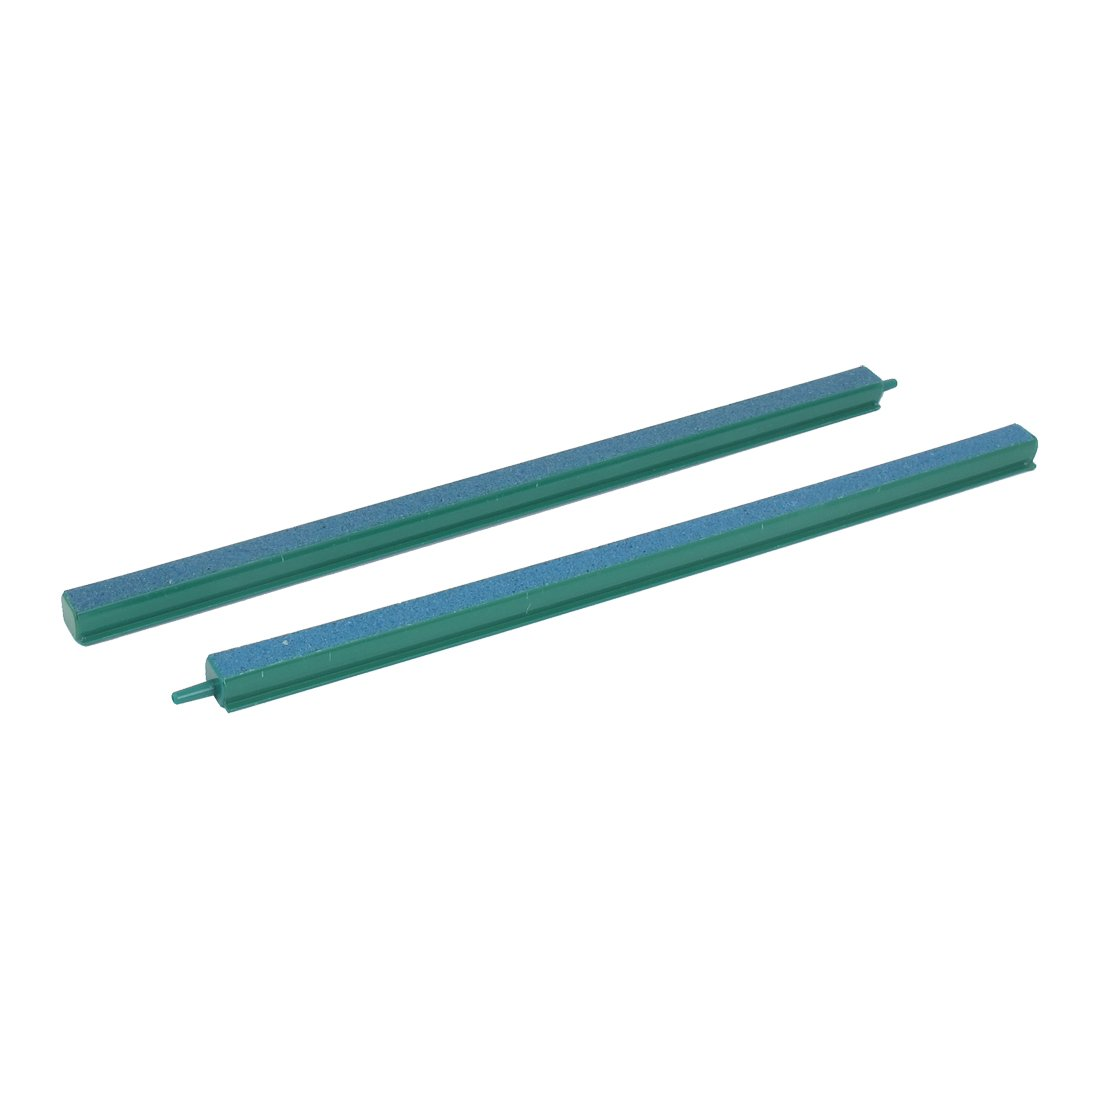 uxcell Aquarium Air Stone Airstone Oxygen Diffuser 14 Inch 2pcs Green Blue